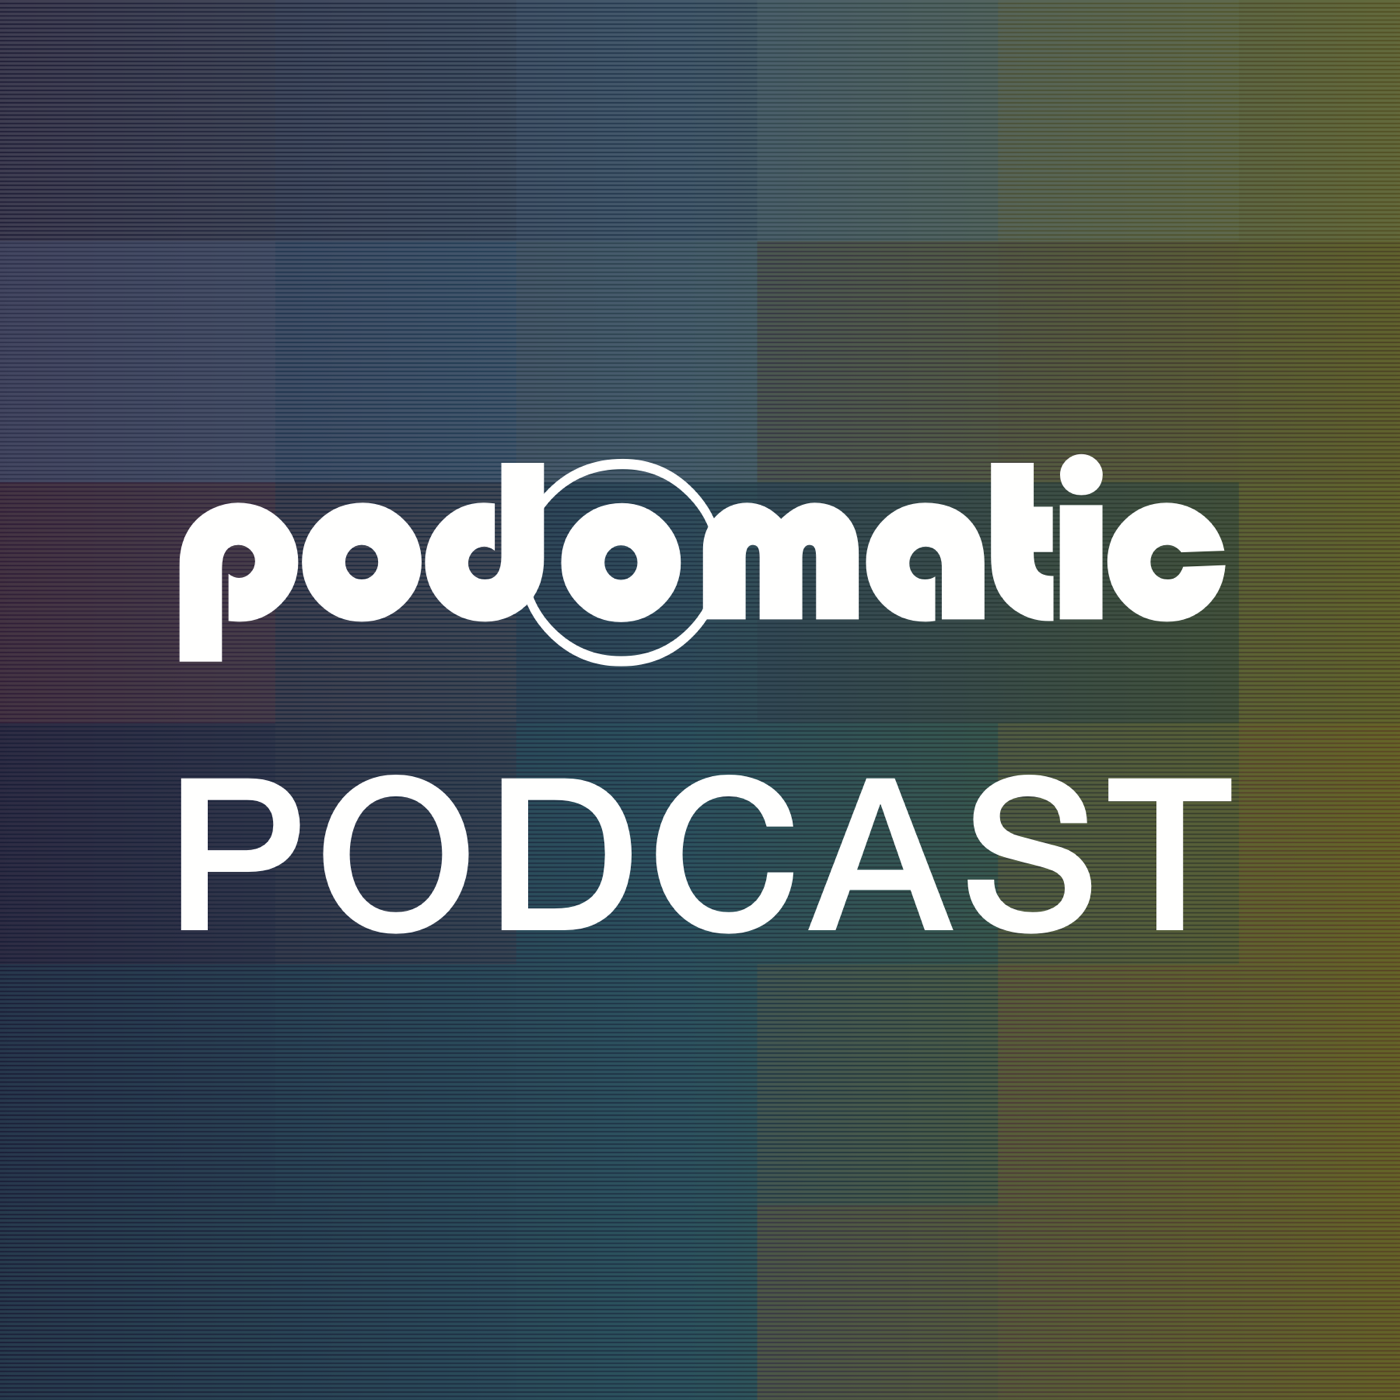 ssampl ee's Podcast